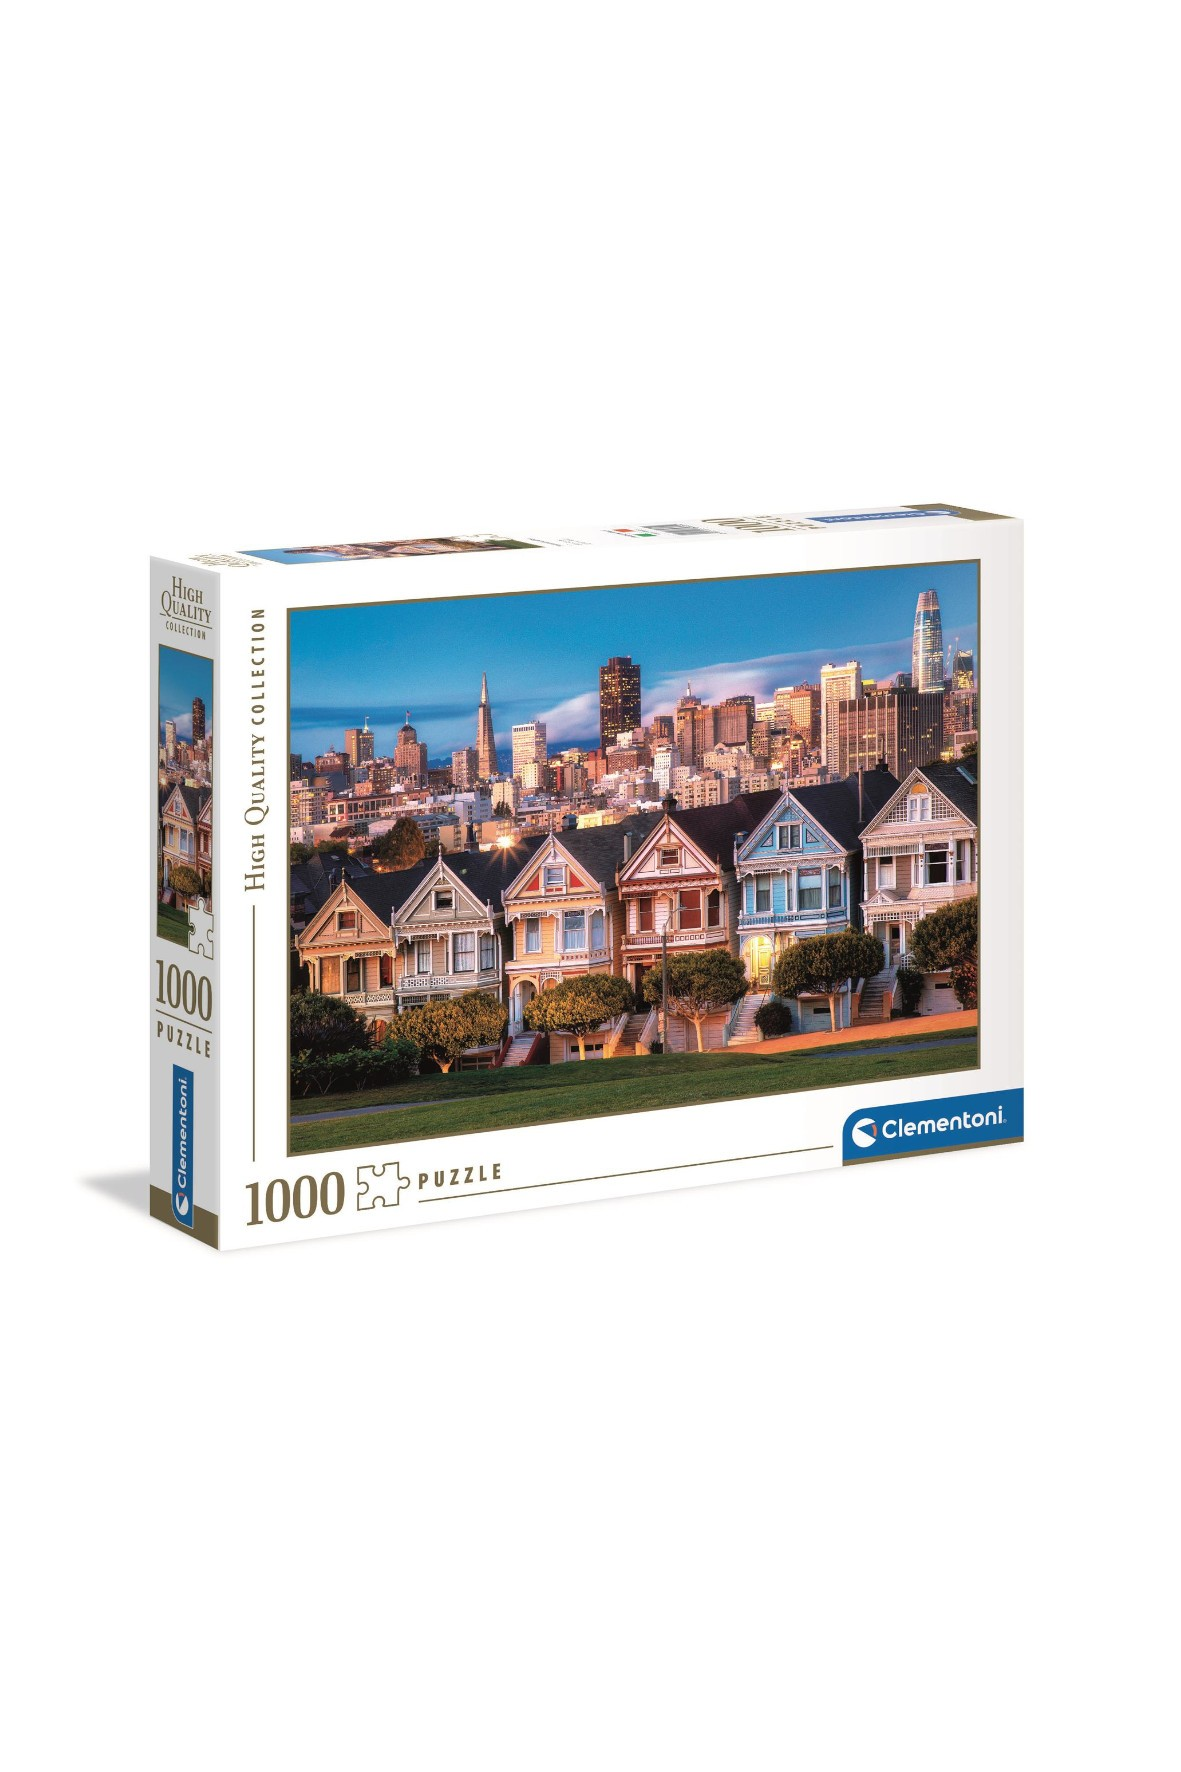 Puzzle Malowane domki Clementoni - 1000 elementów